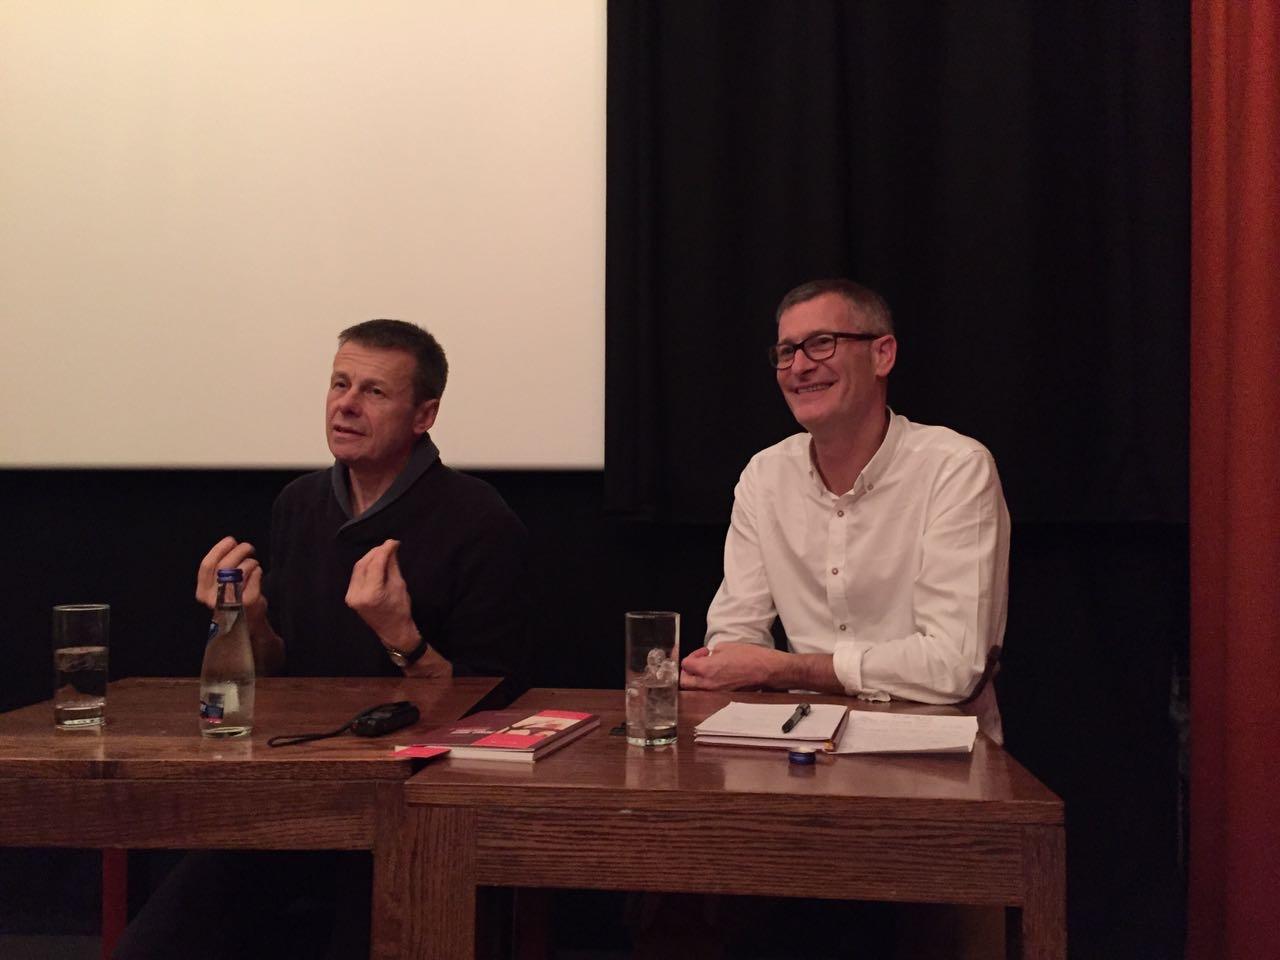 Post screening at the IFI in October (Alan Gilsenan - left)